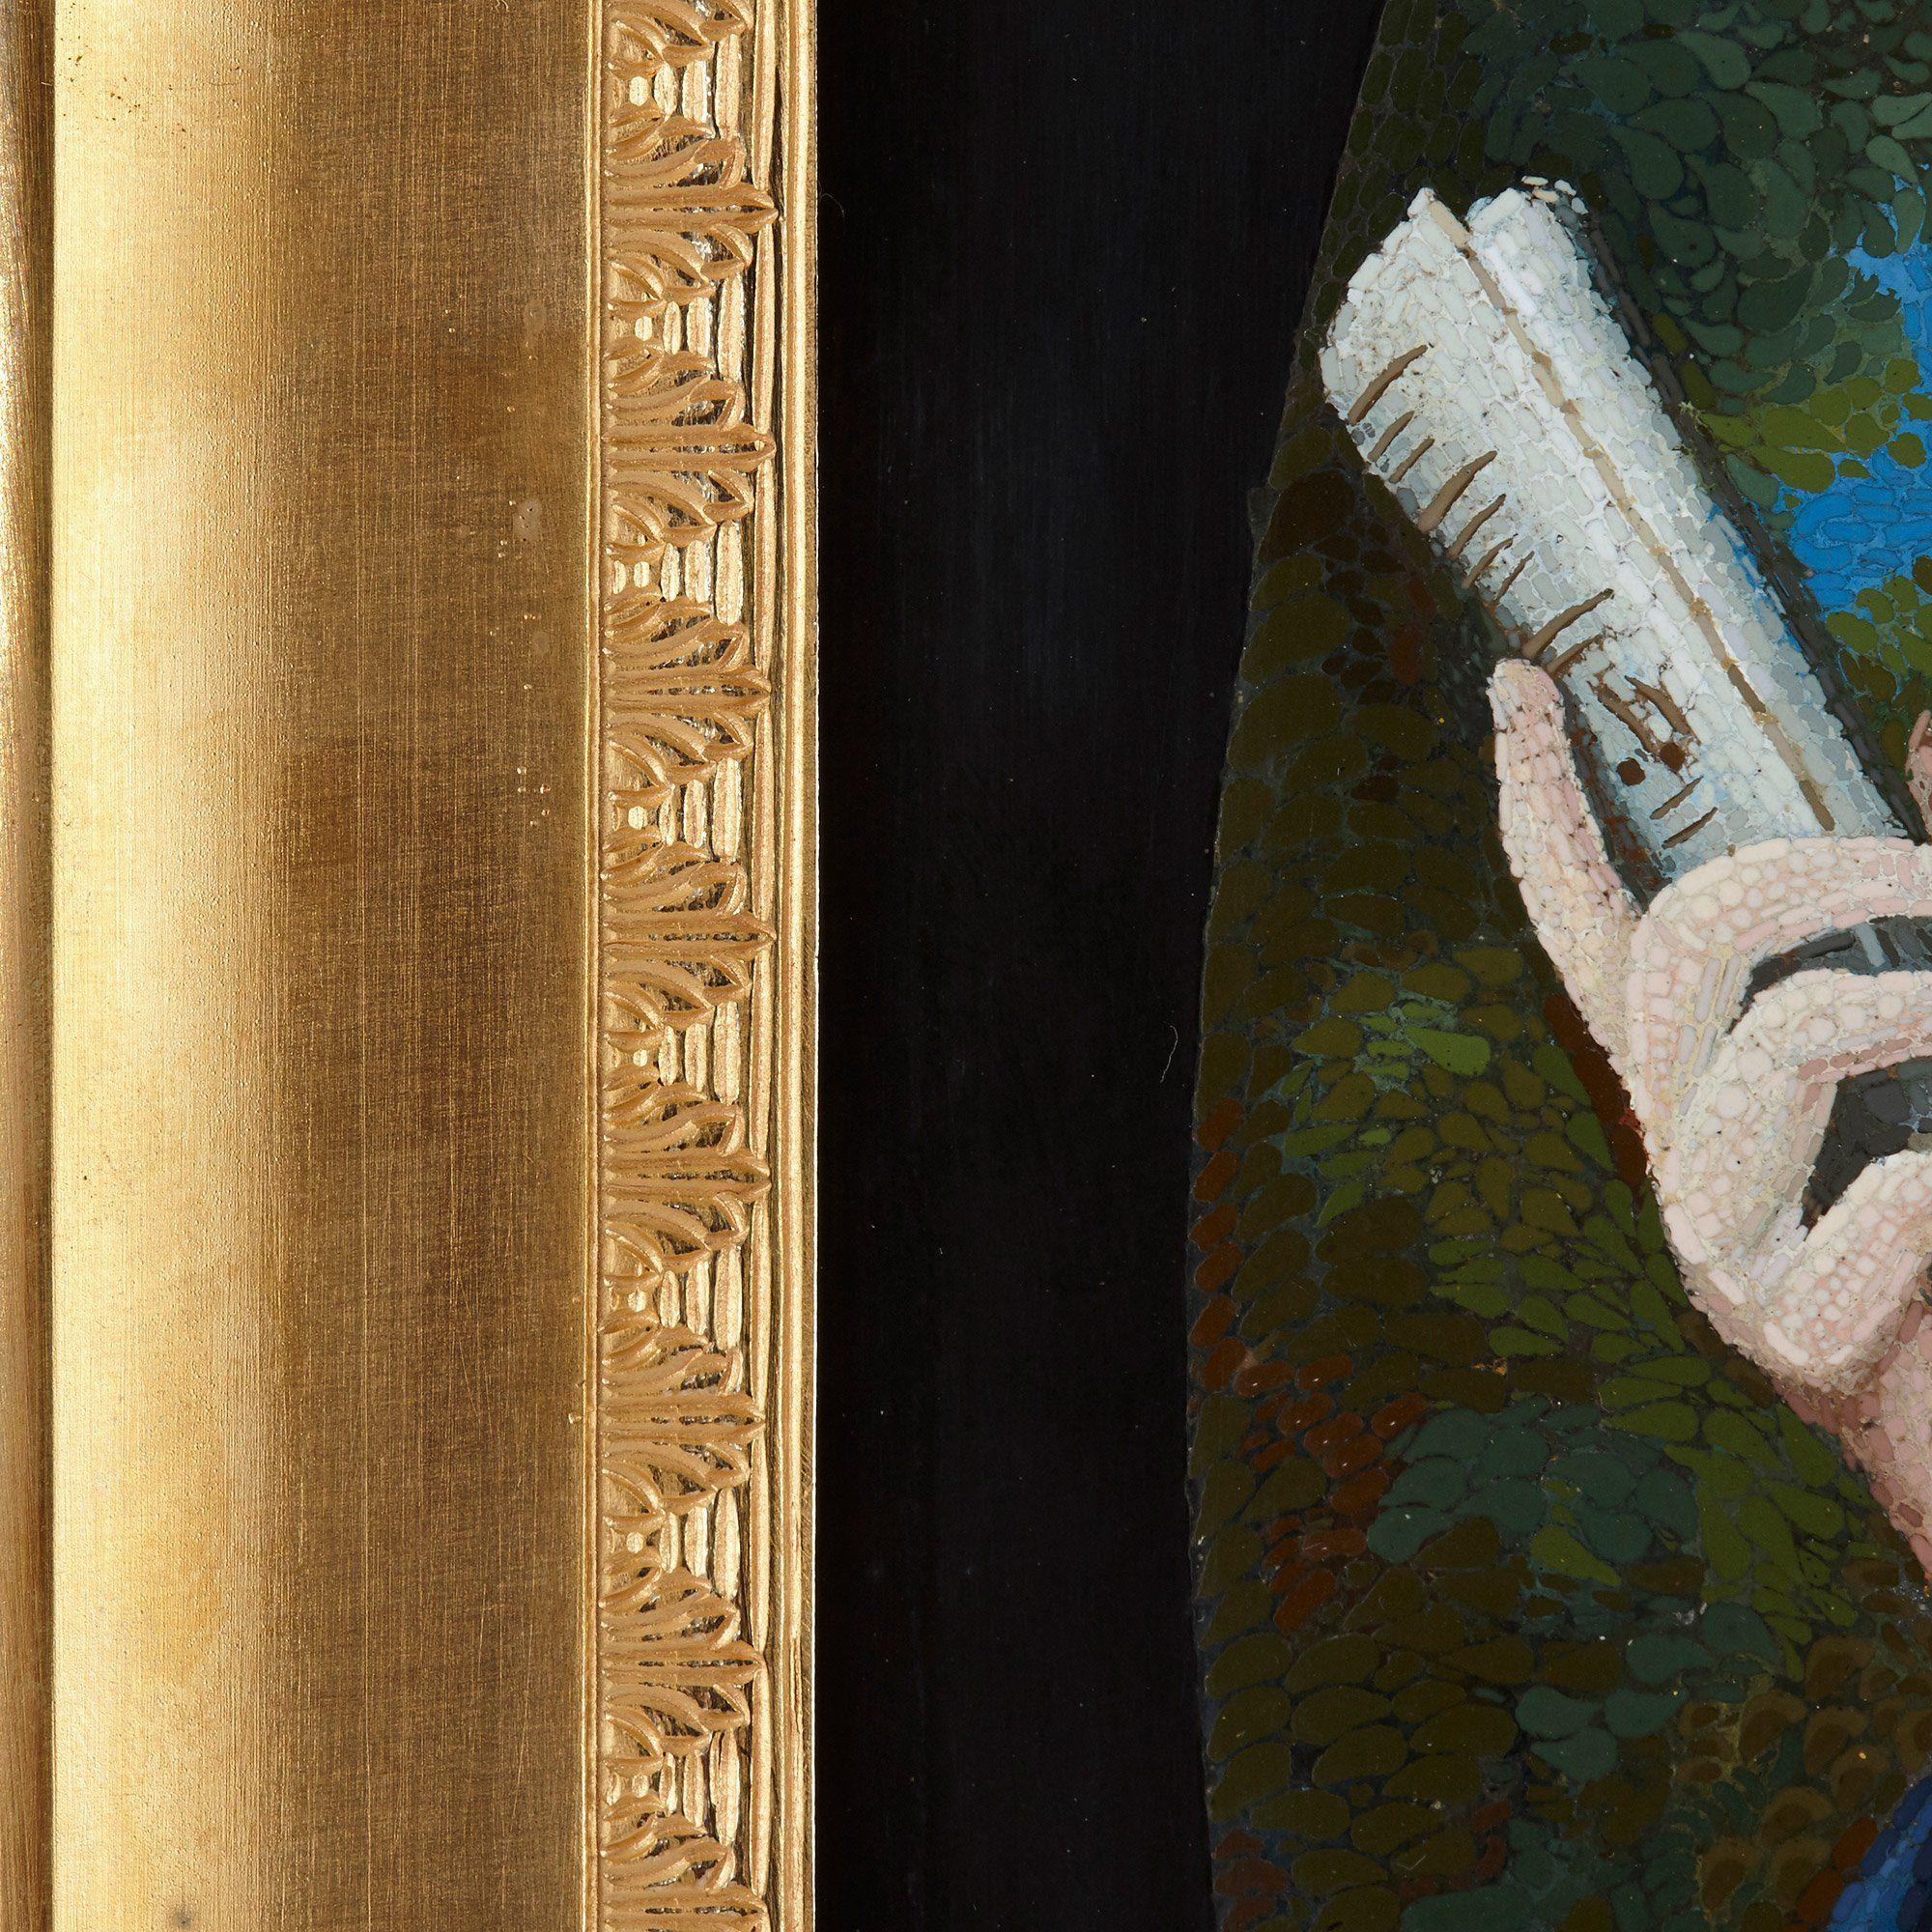 Antique Baroque style Italian micromosaic portrait panel